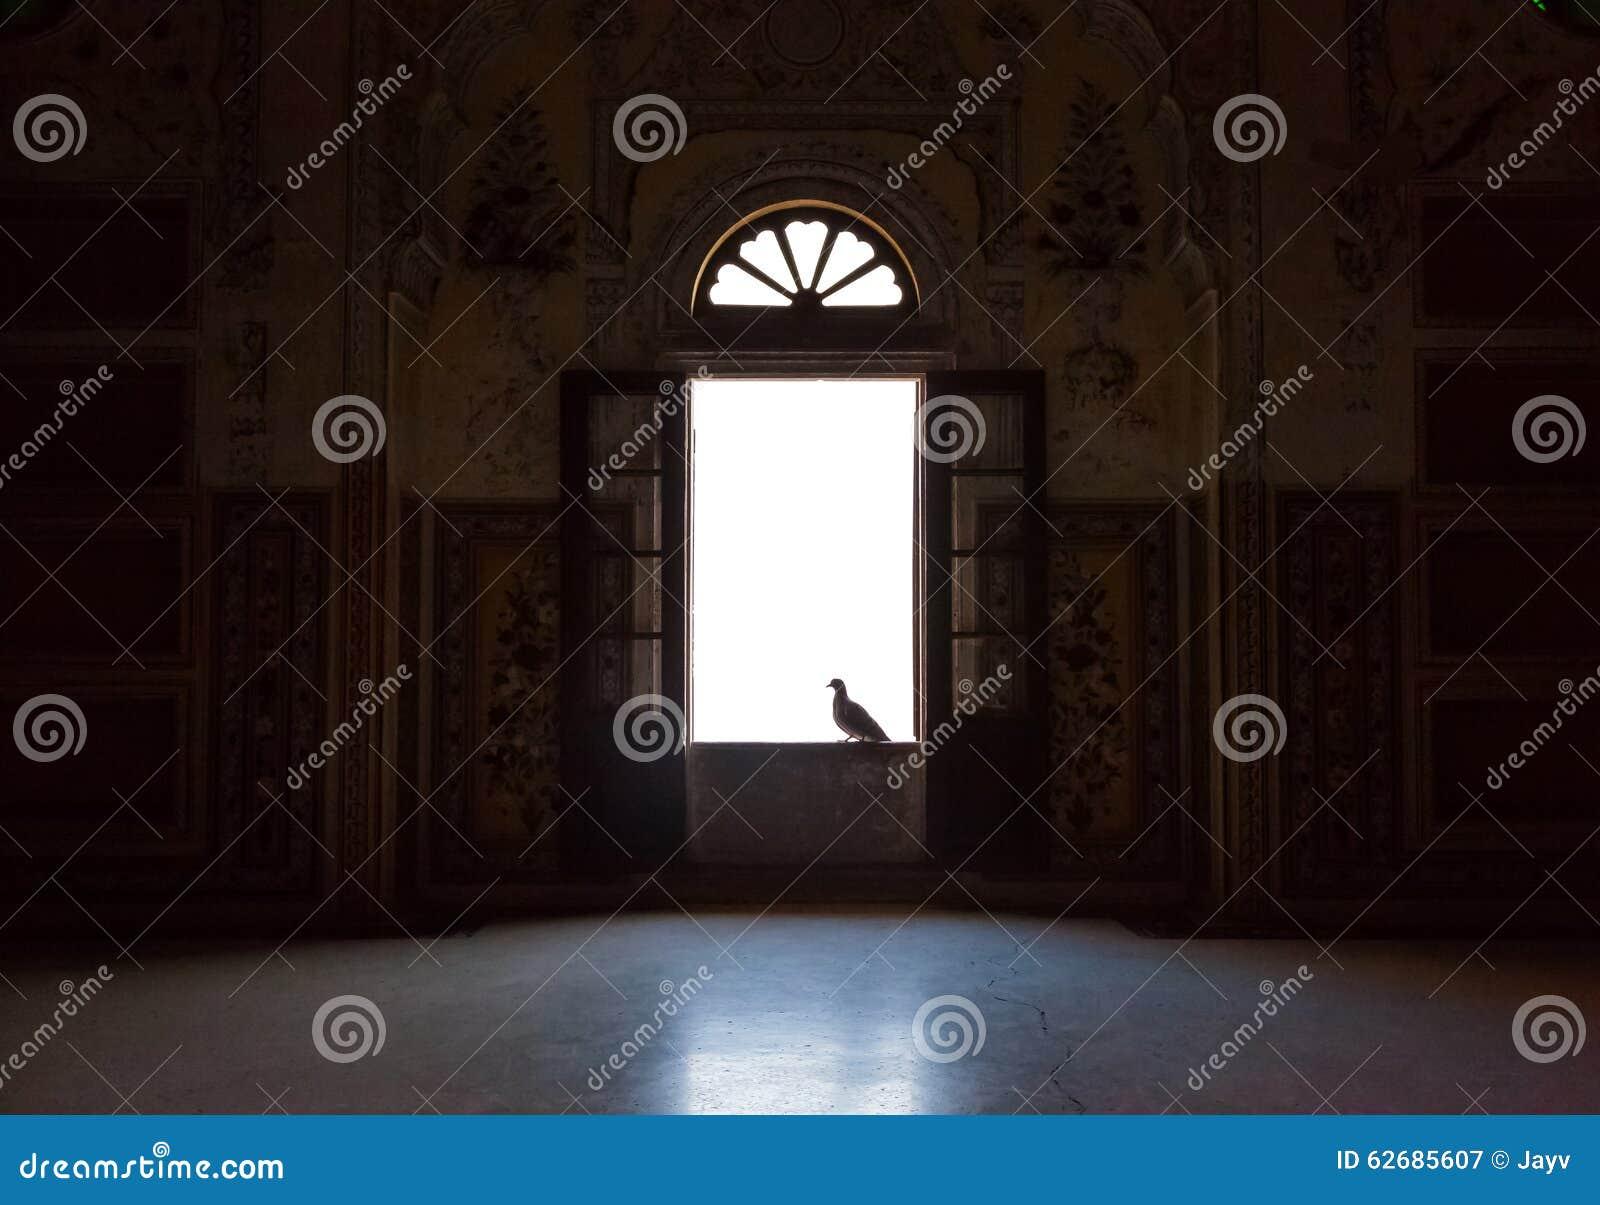 Pigeon on the window